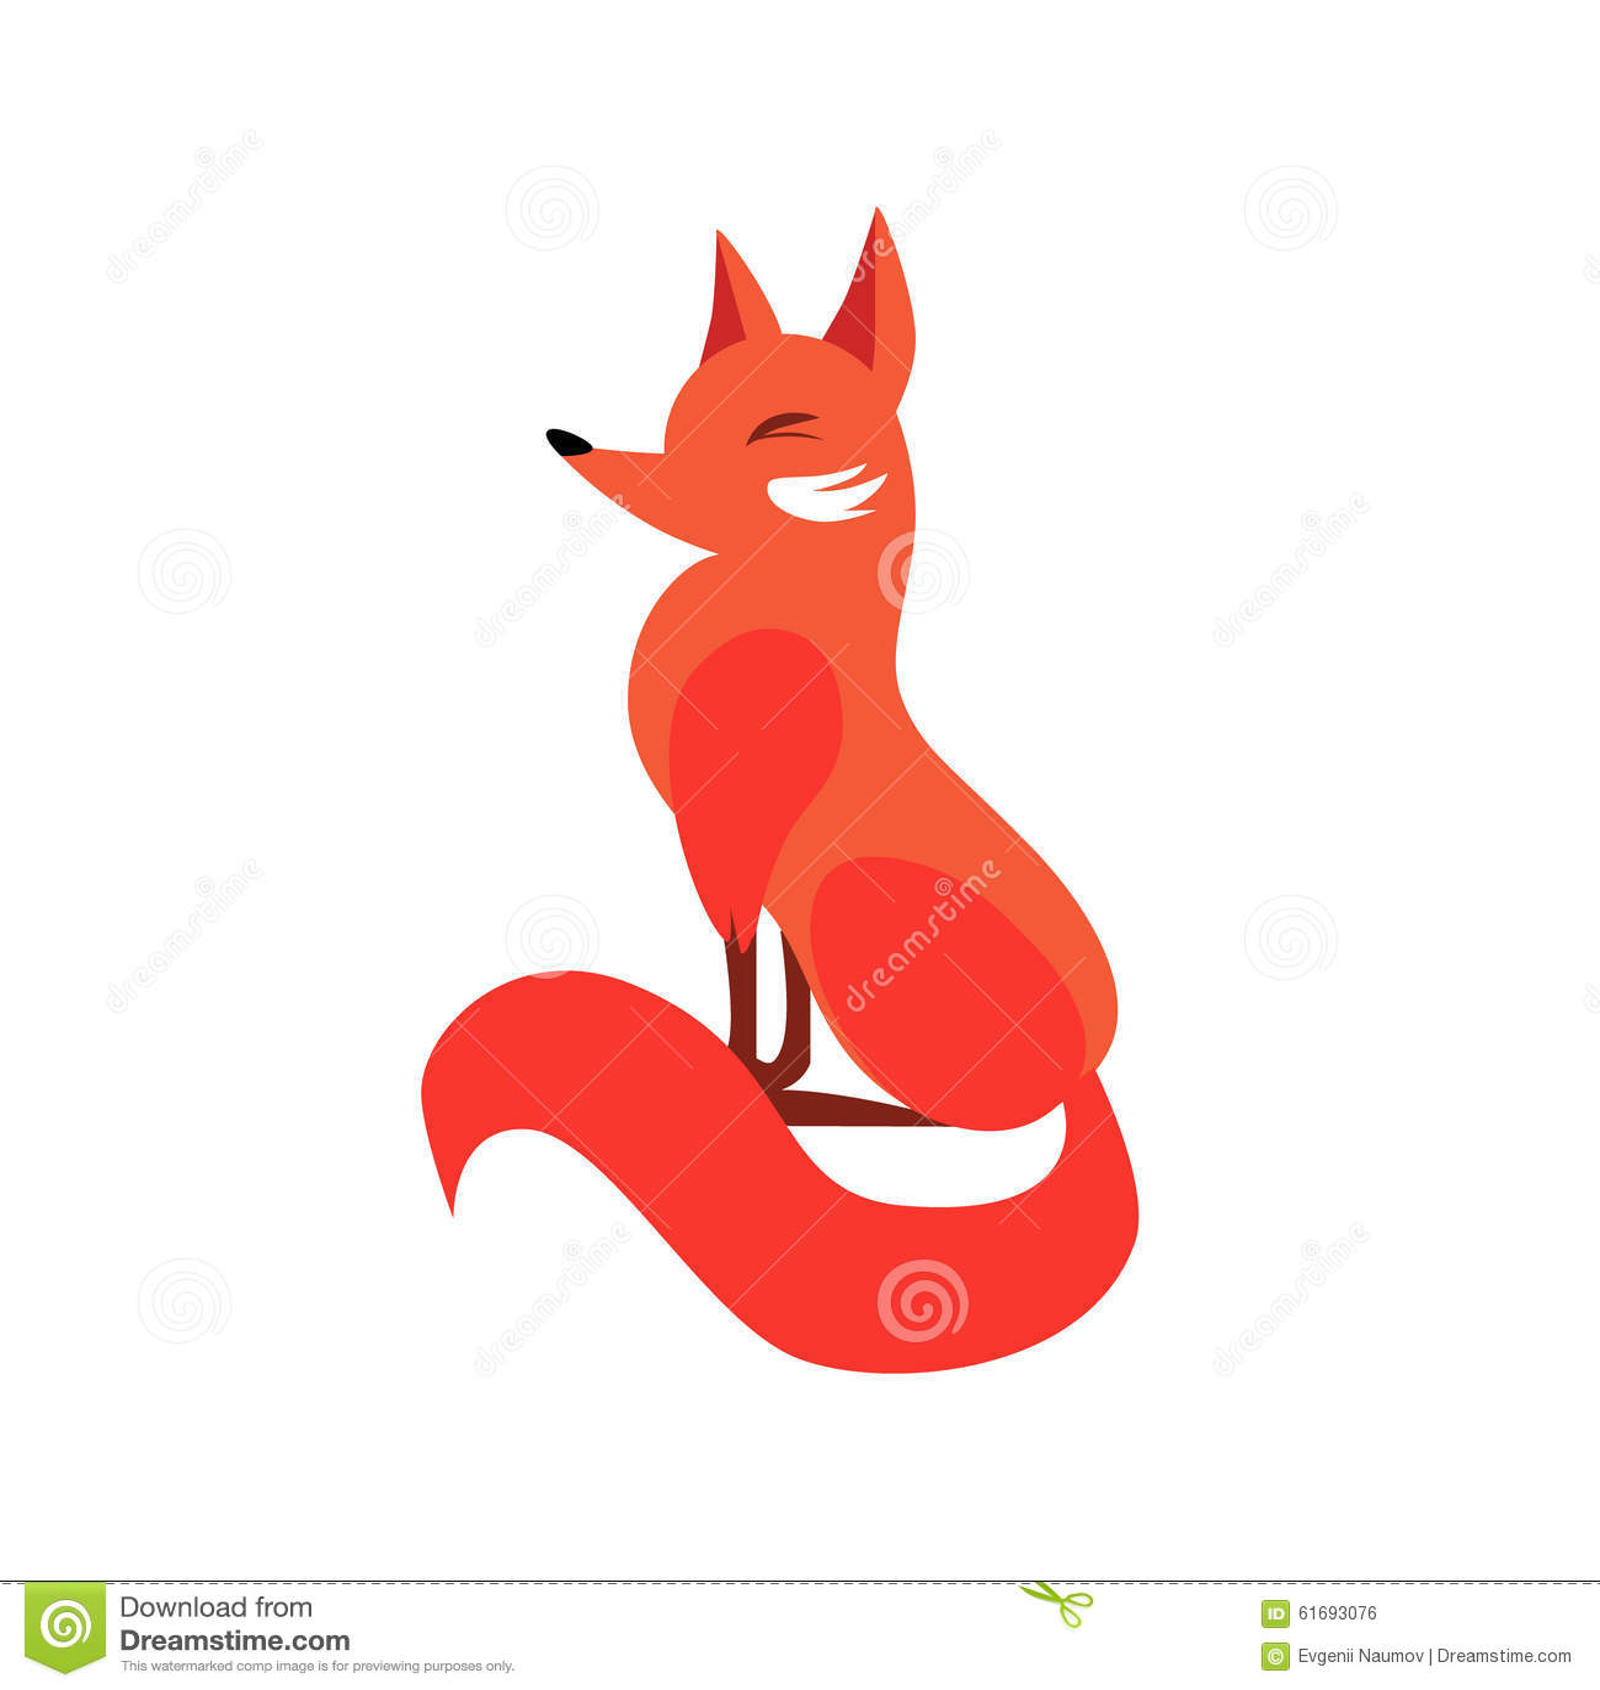 Sitting fox illustration - photo#5